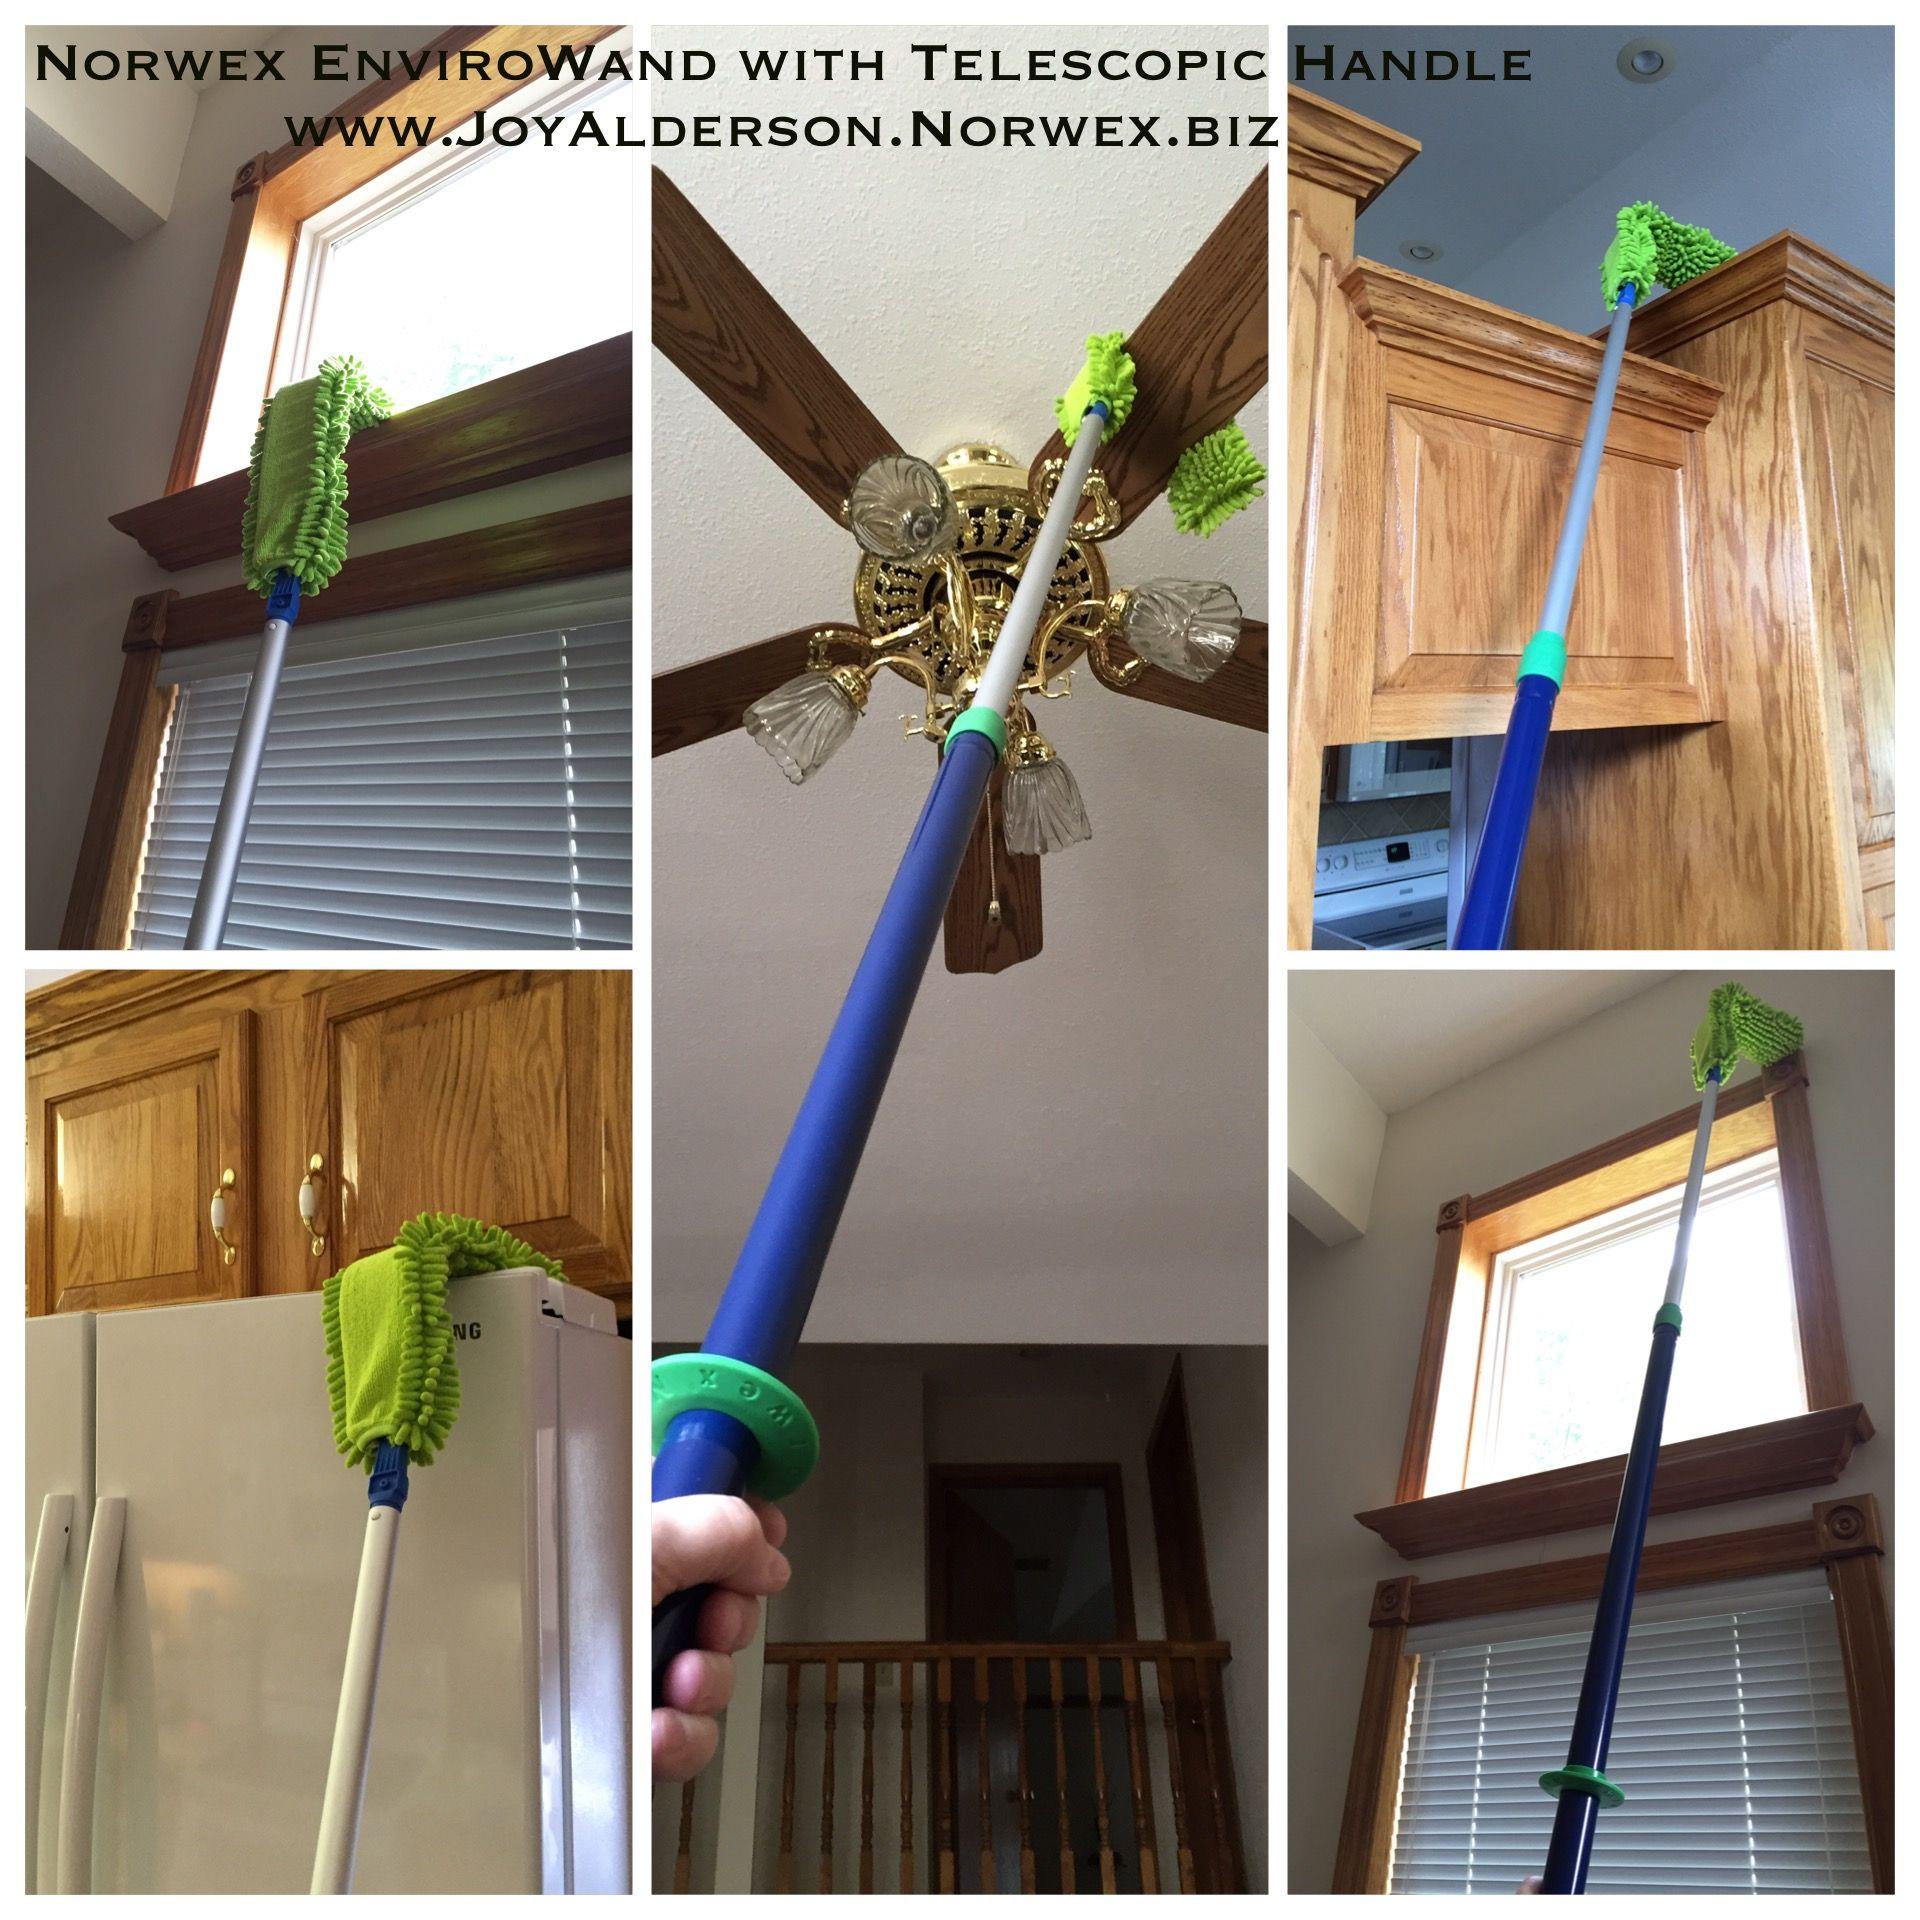 Norwex Window Cleaning: Norwex 1 Telescopic Mop Handle 2 Conversion Kit 3 Mop